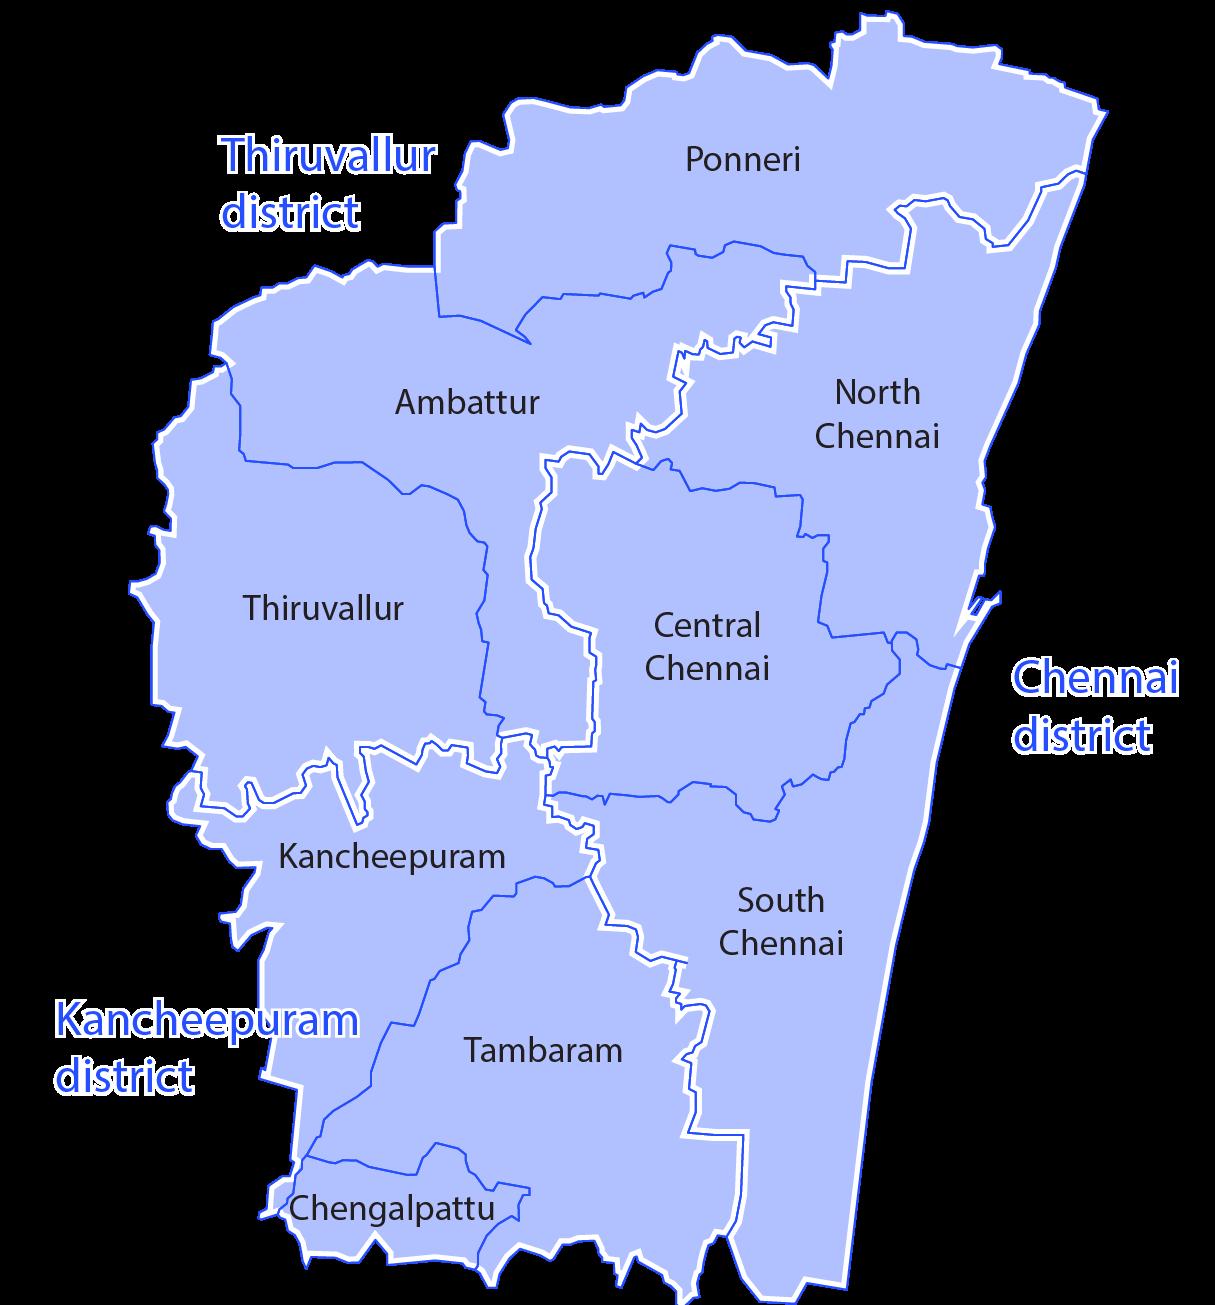 Speculation on Property in Chennai: Location Mudichur